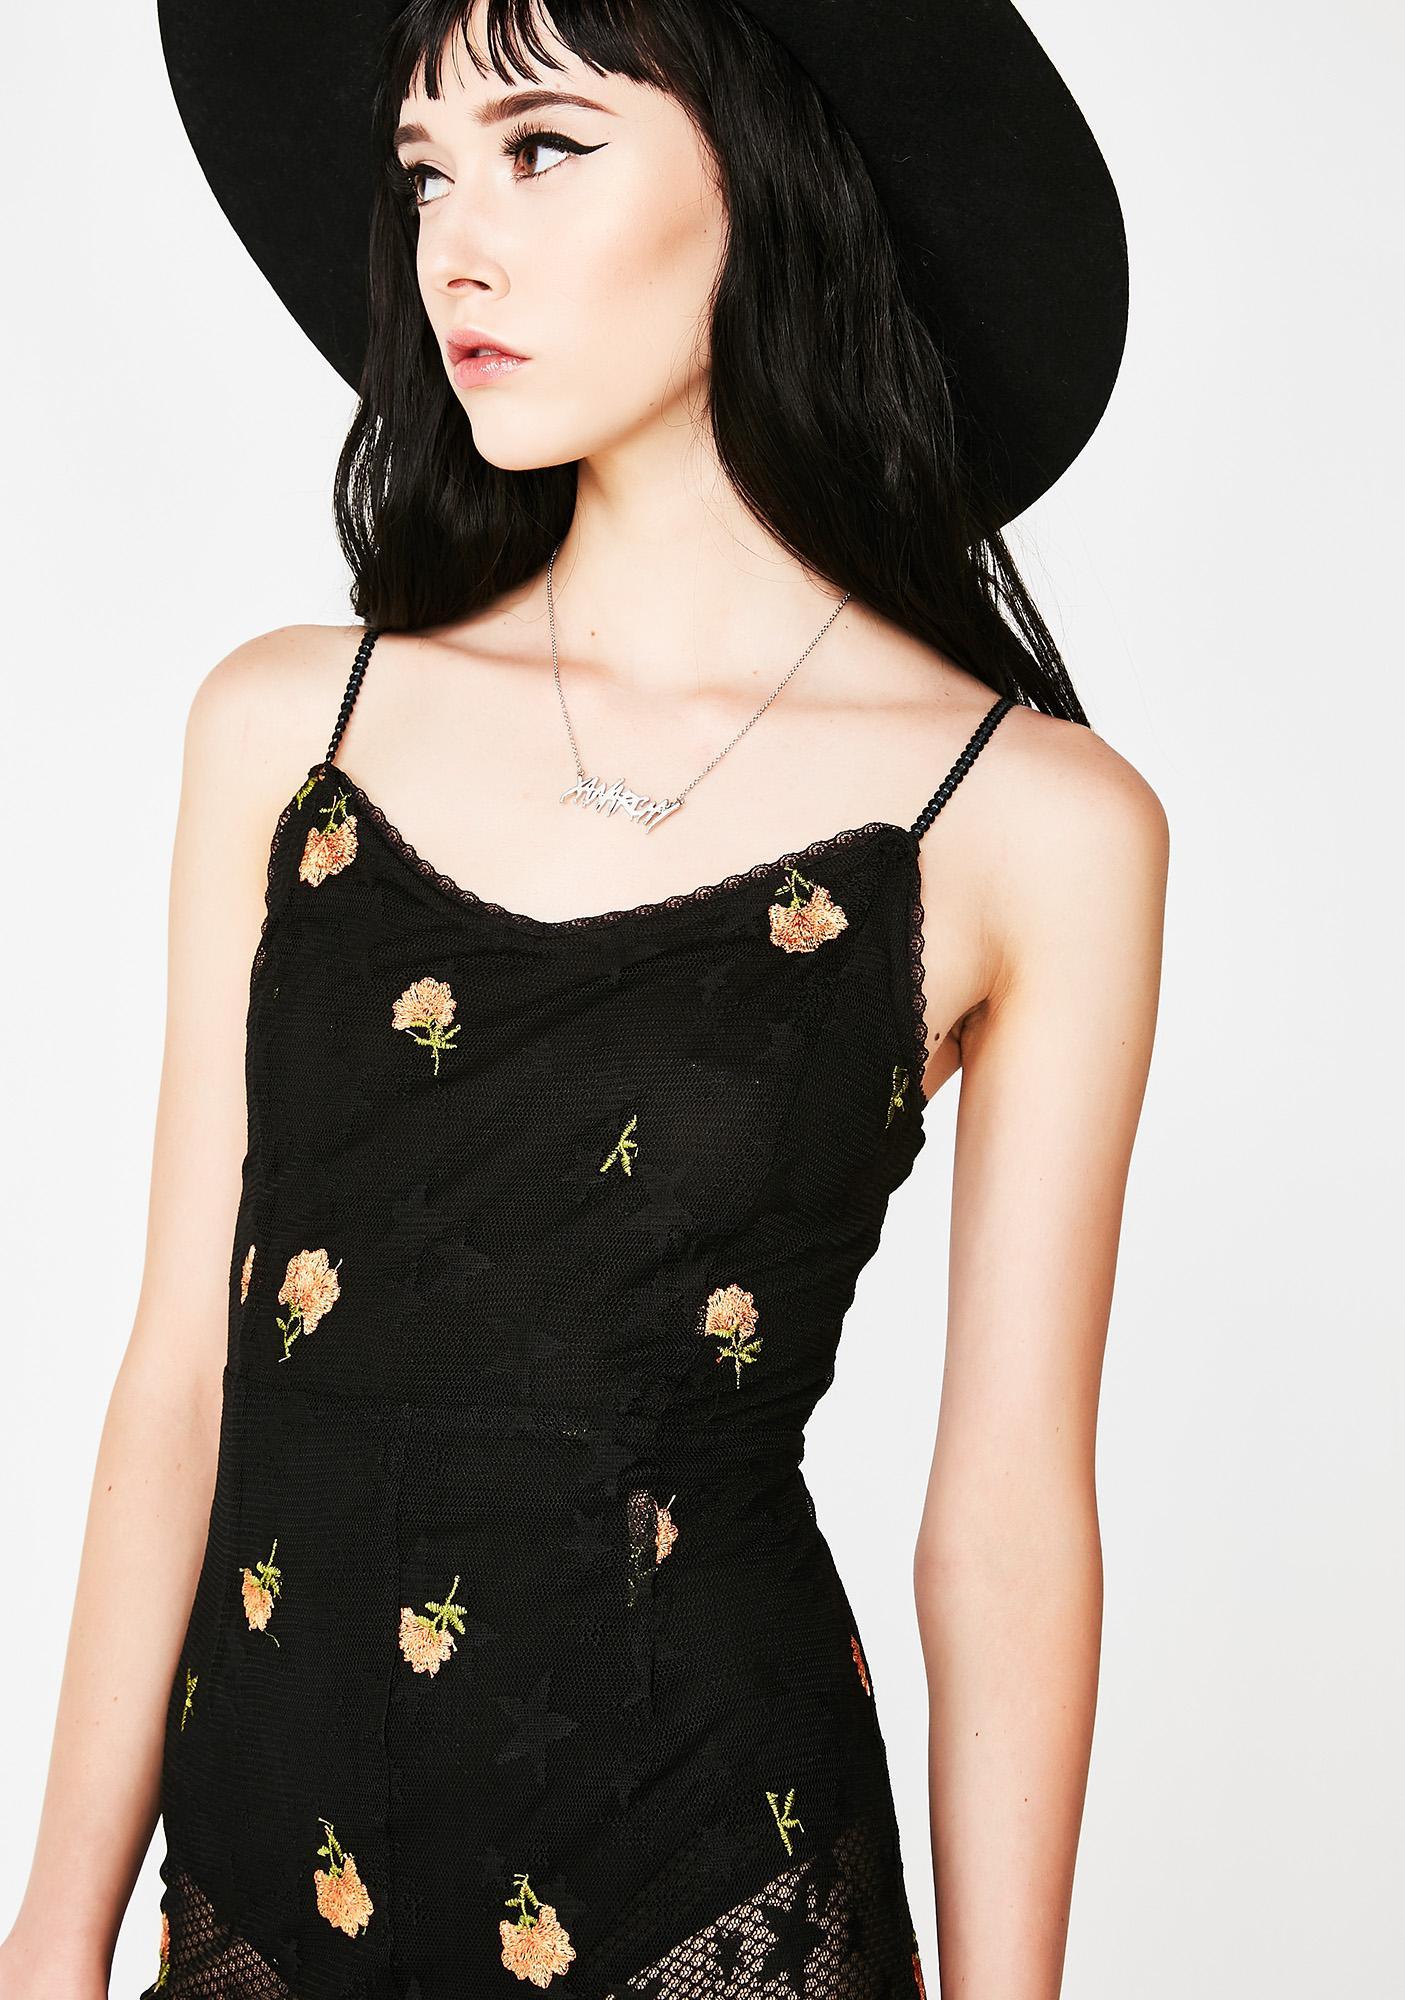 Starry Nightz Leotard Dress